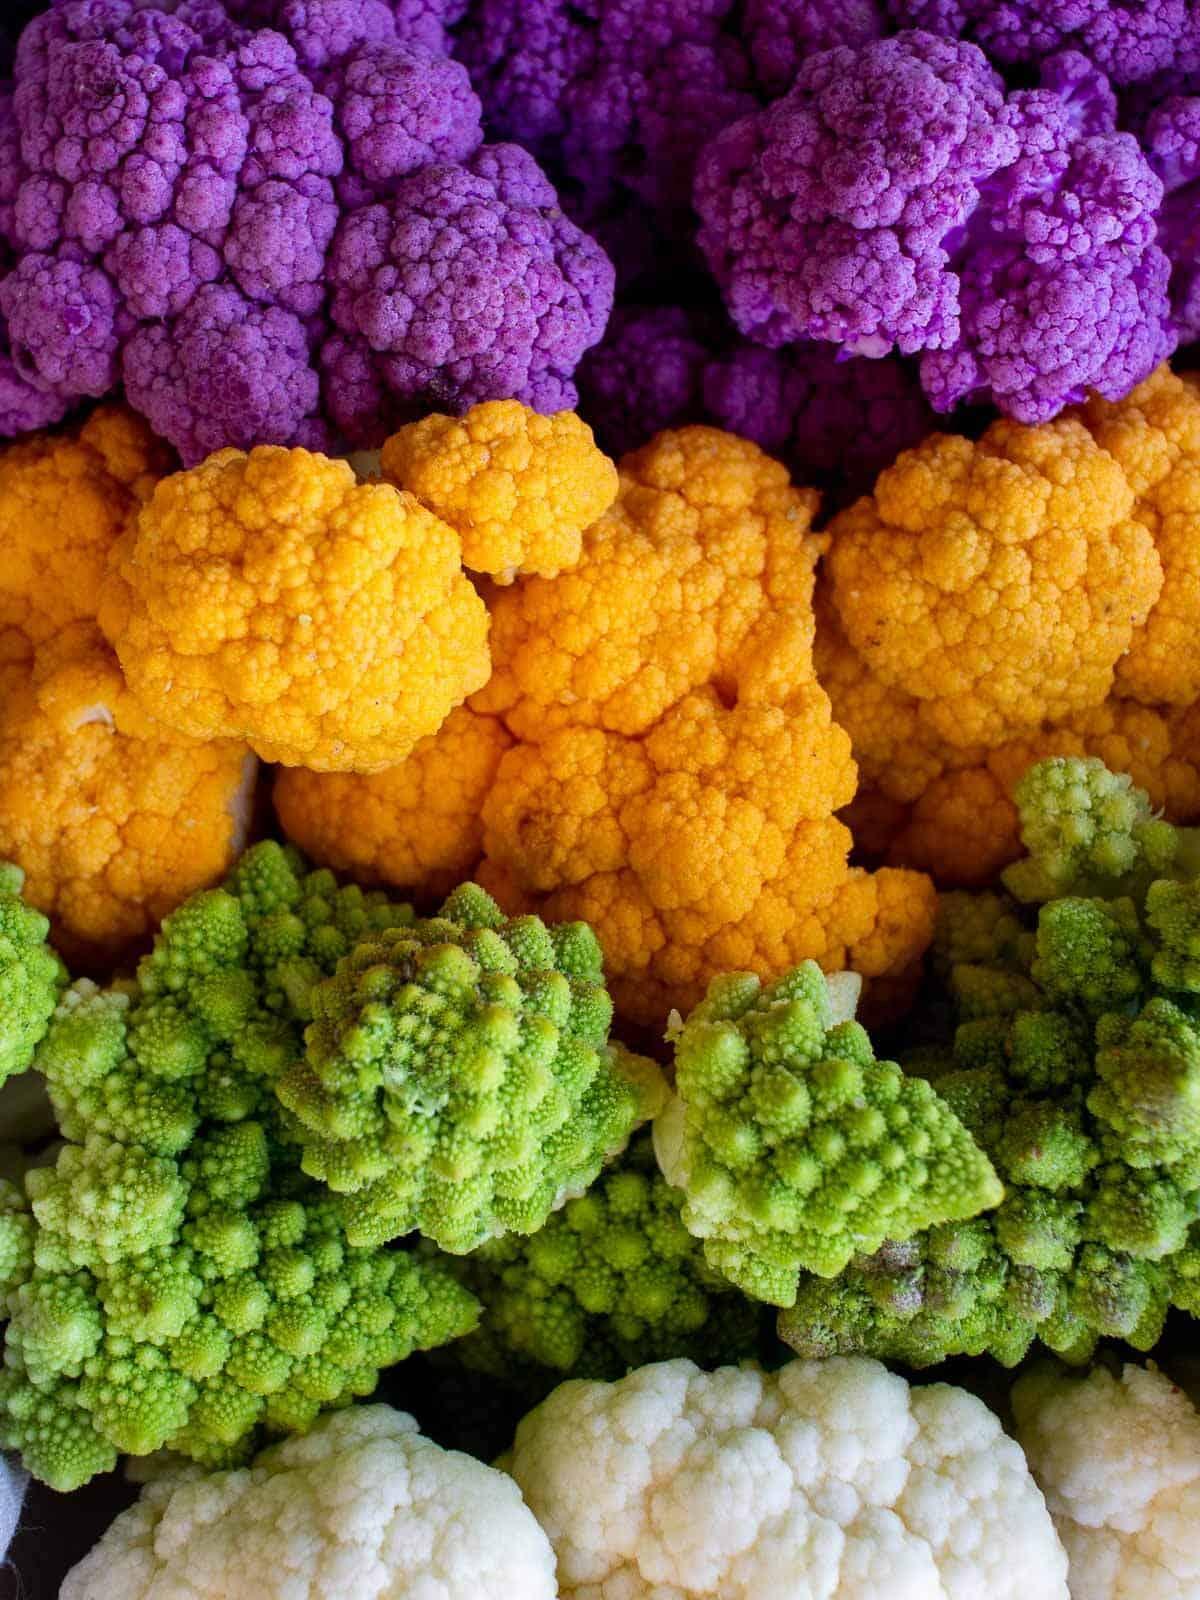 colorful broccoli and cauliflowers